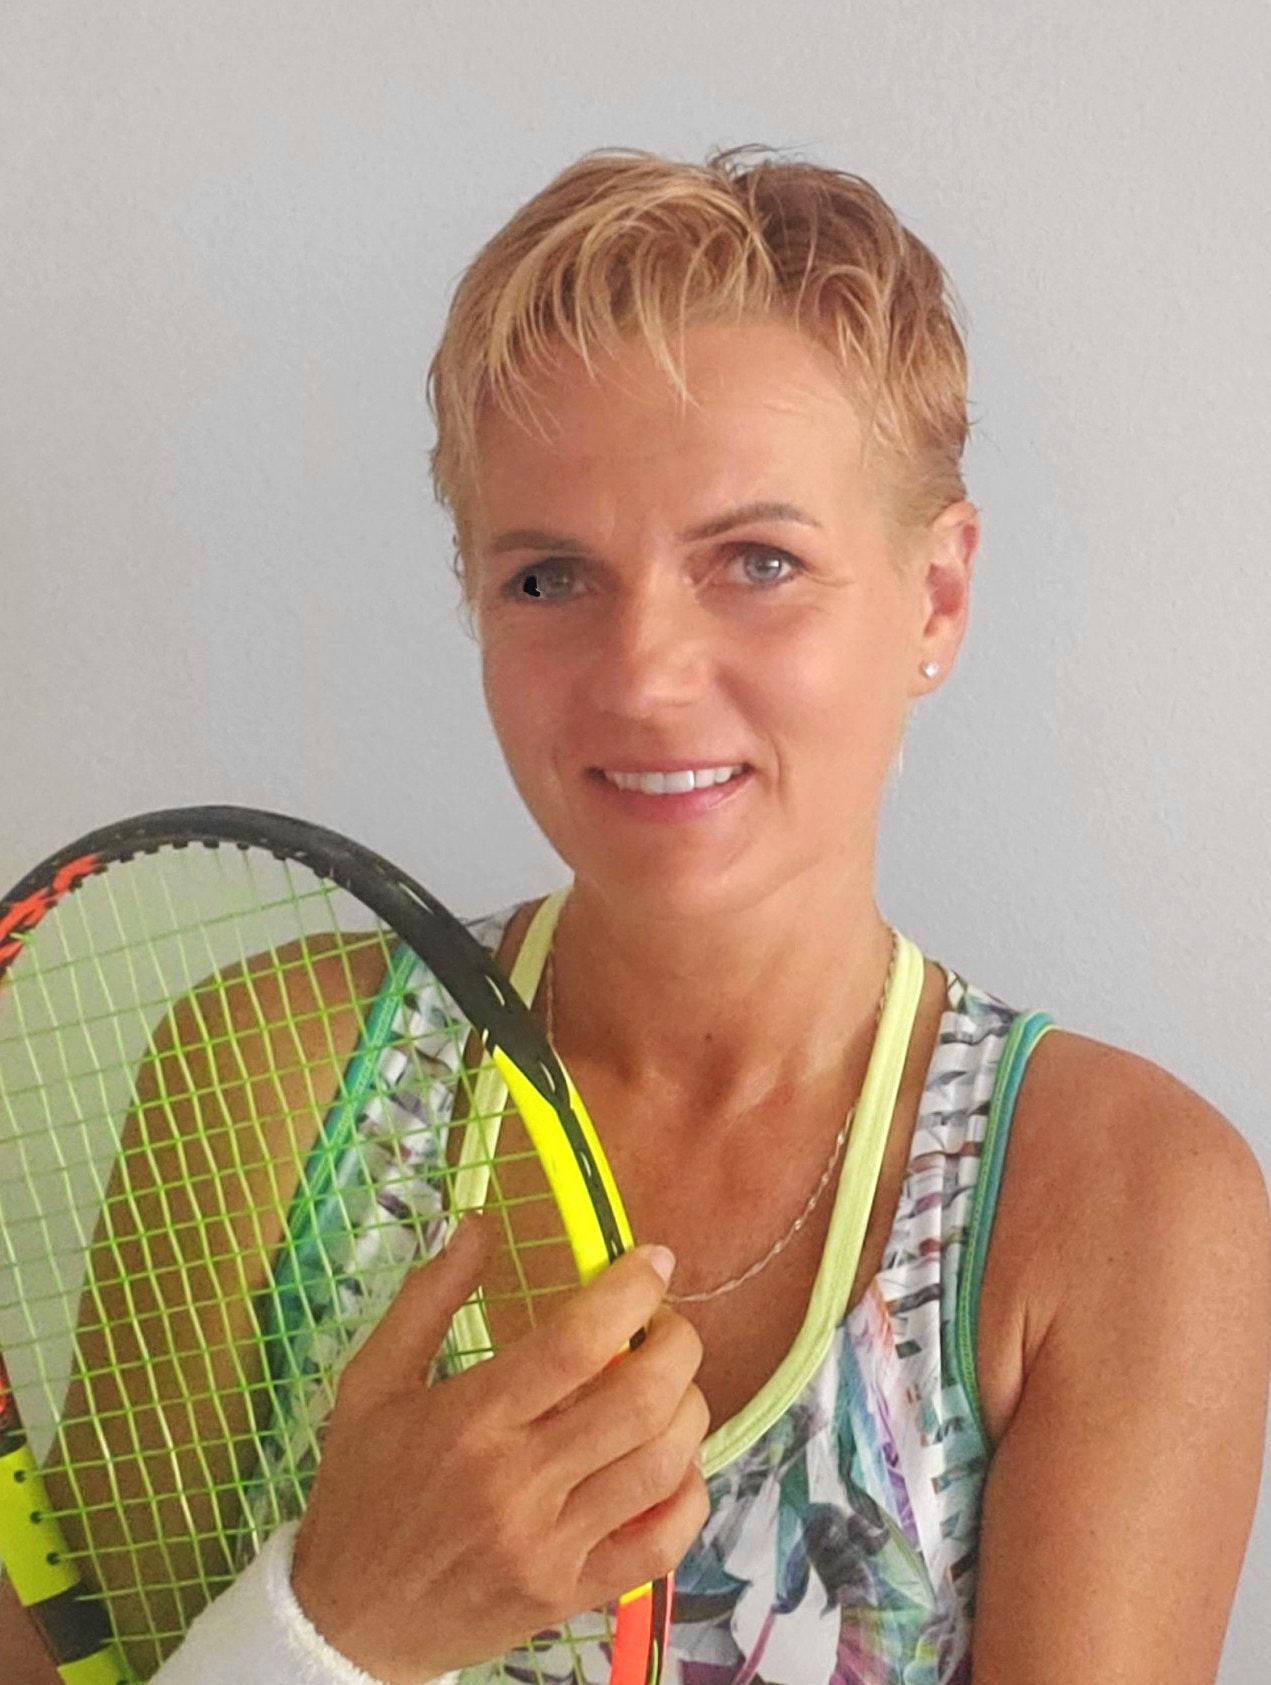 Edyta W. teaches tennis lessons in Palm Coast, FL